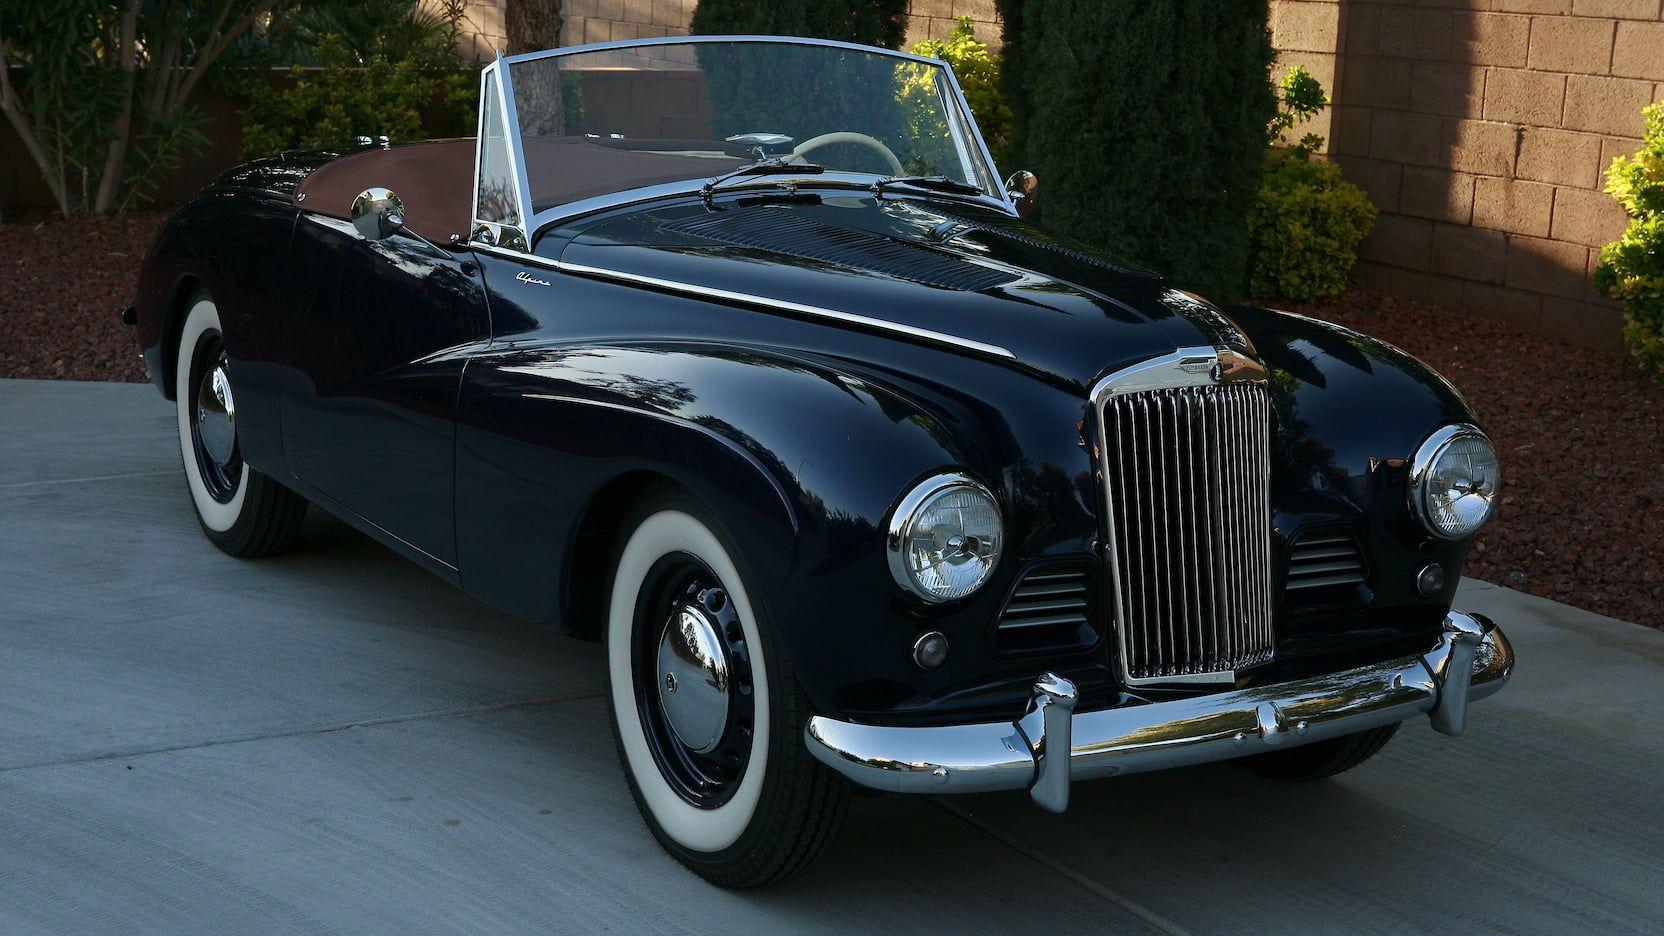 1955 Sunbeam Alpine Mark III Convertible presented as Lot